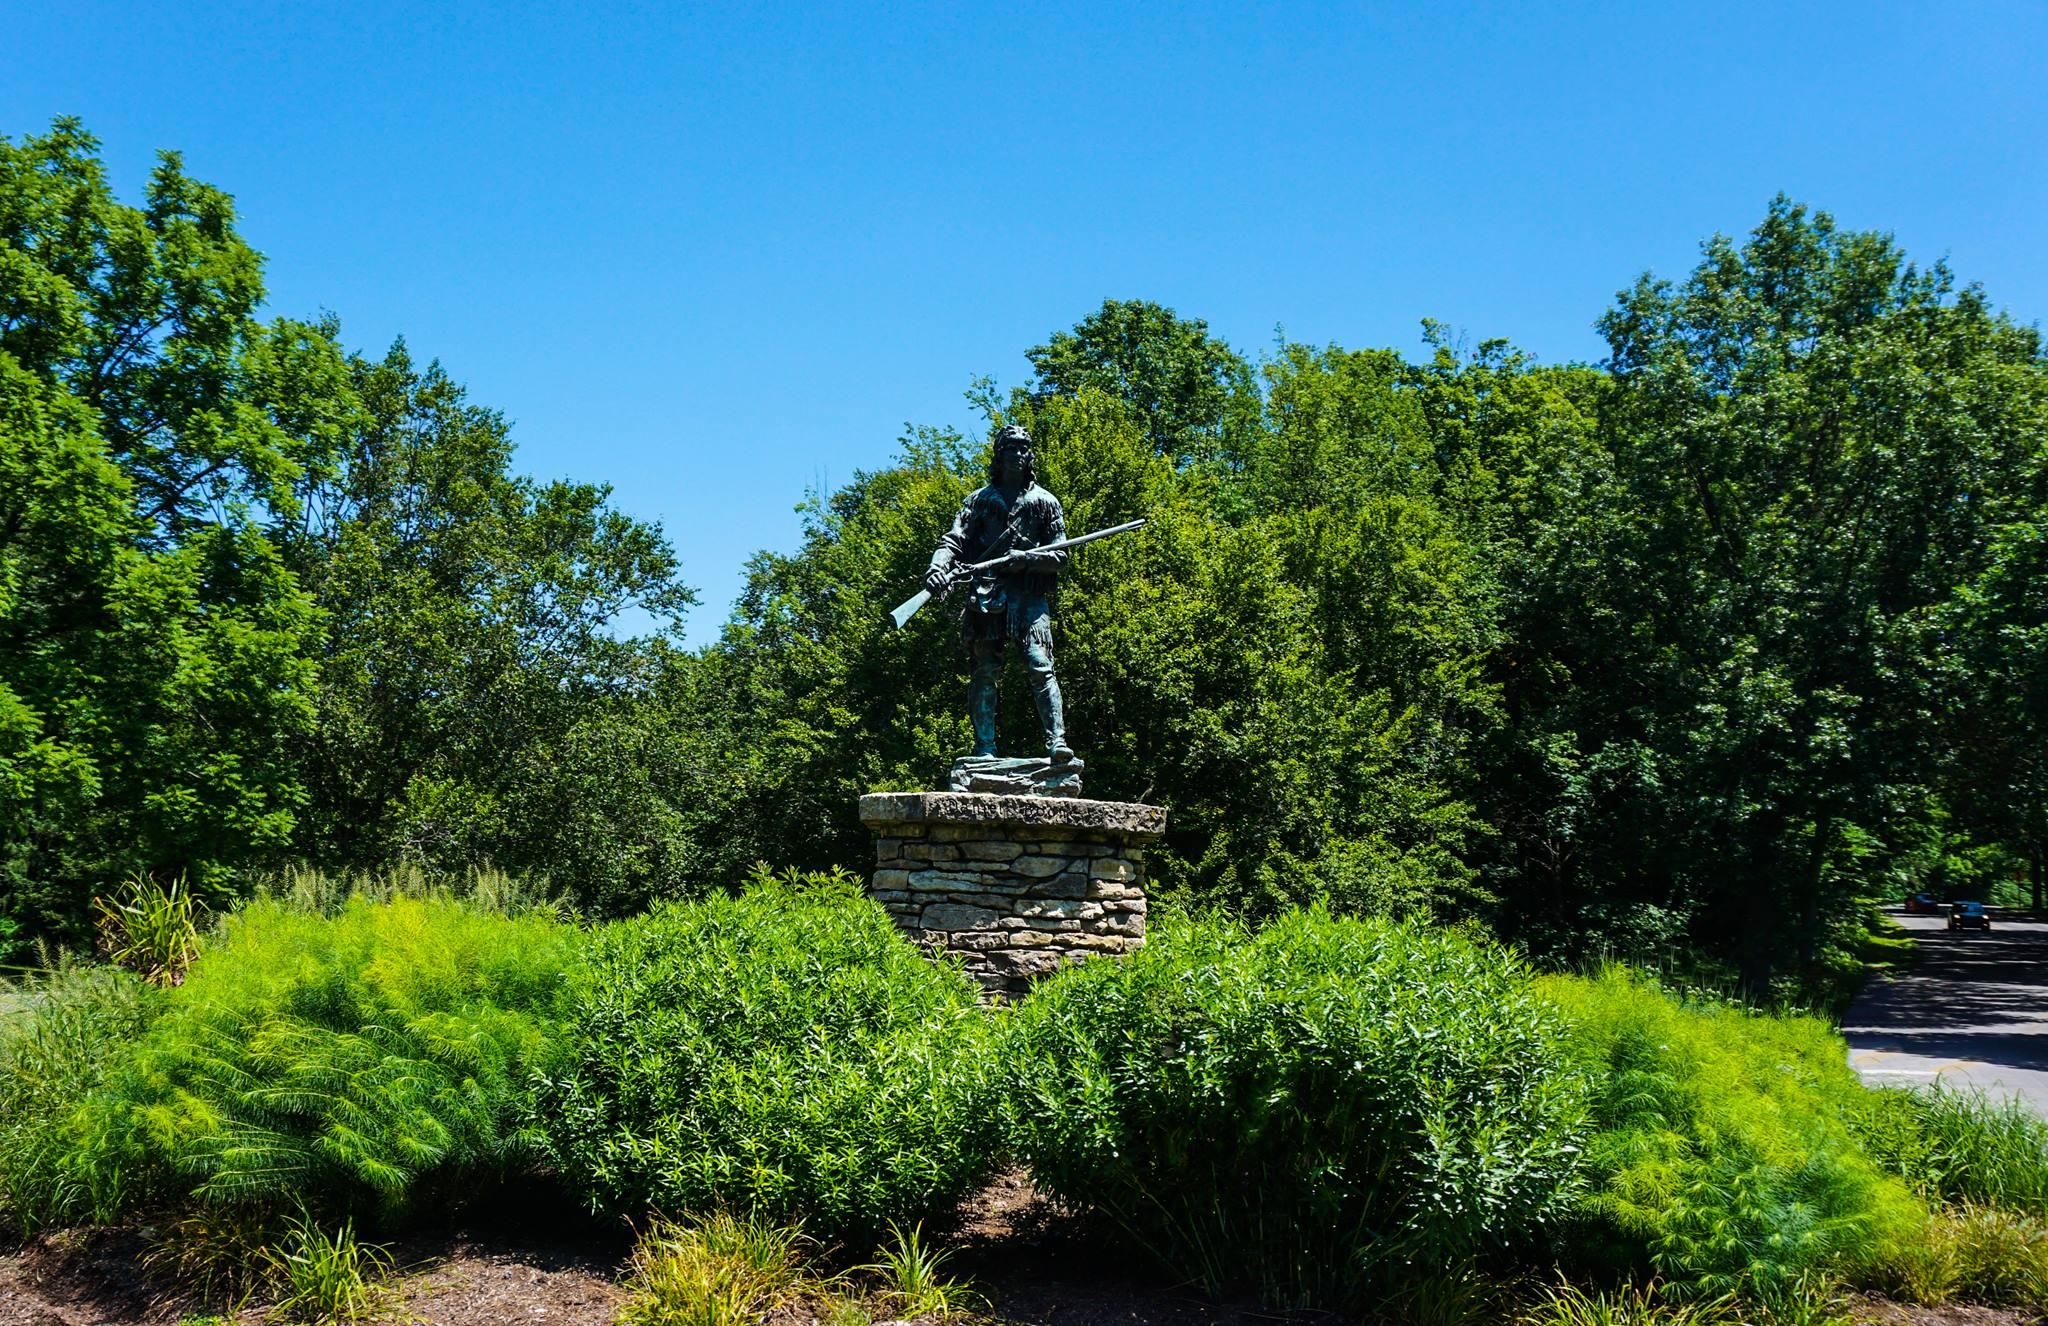 Daniel Boone Statue in Cherokee Park